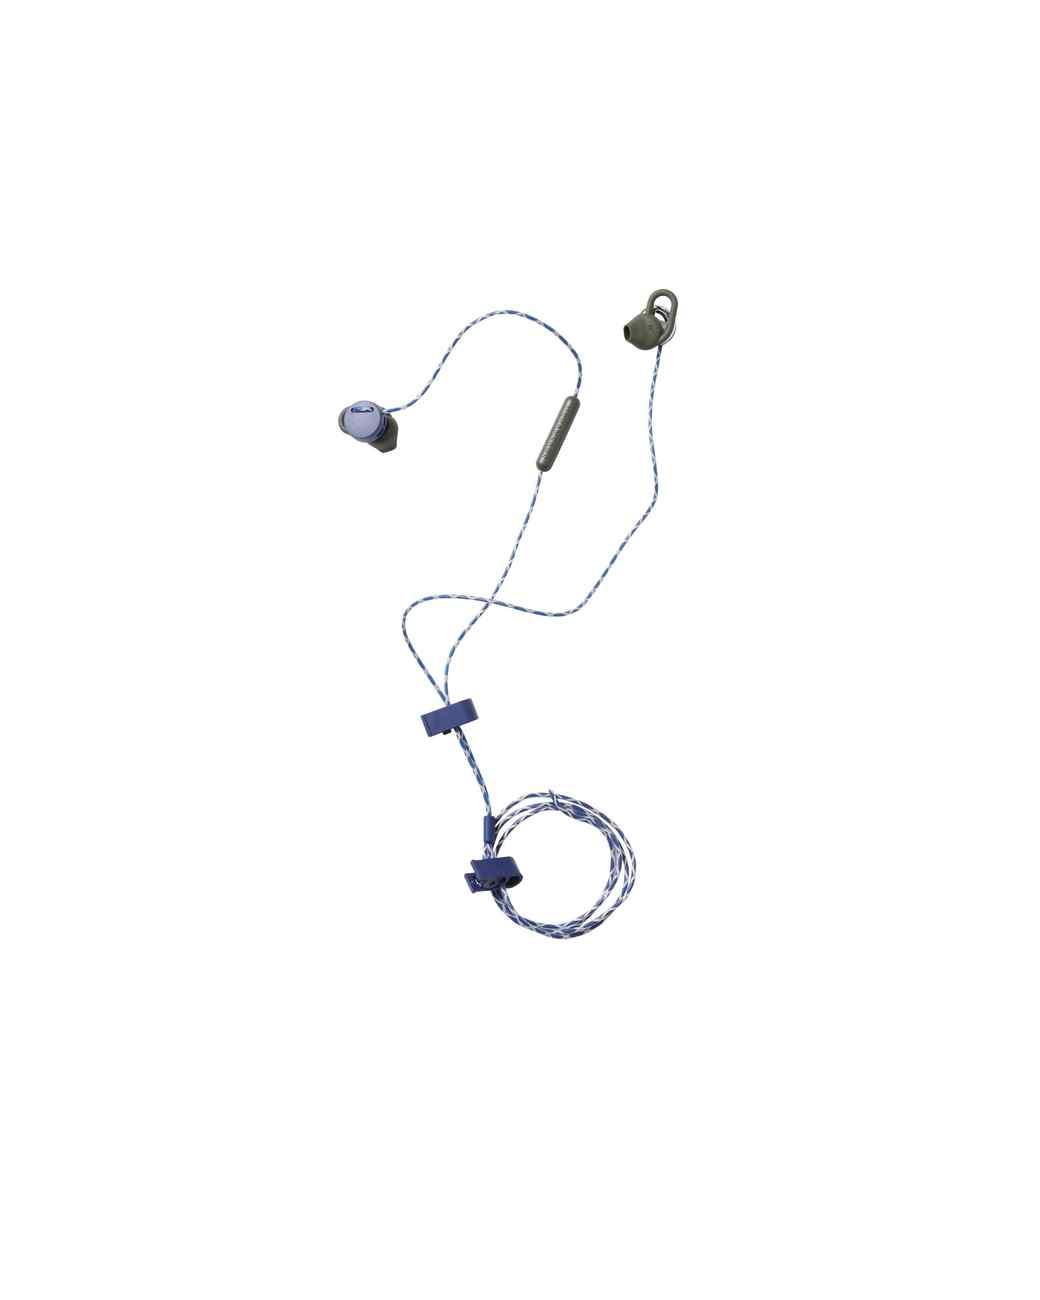 headphones-087-d112972_l.jpg